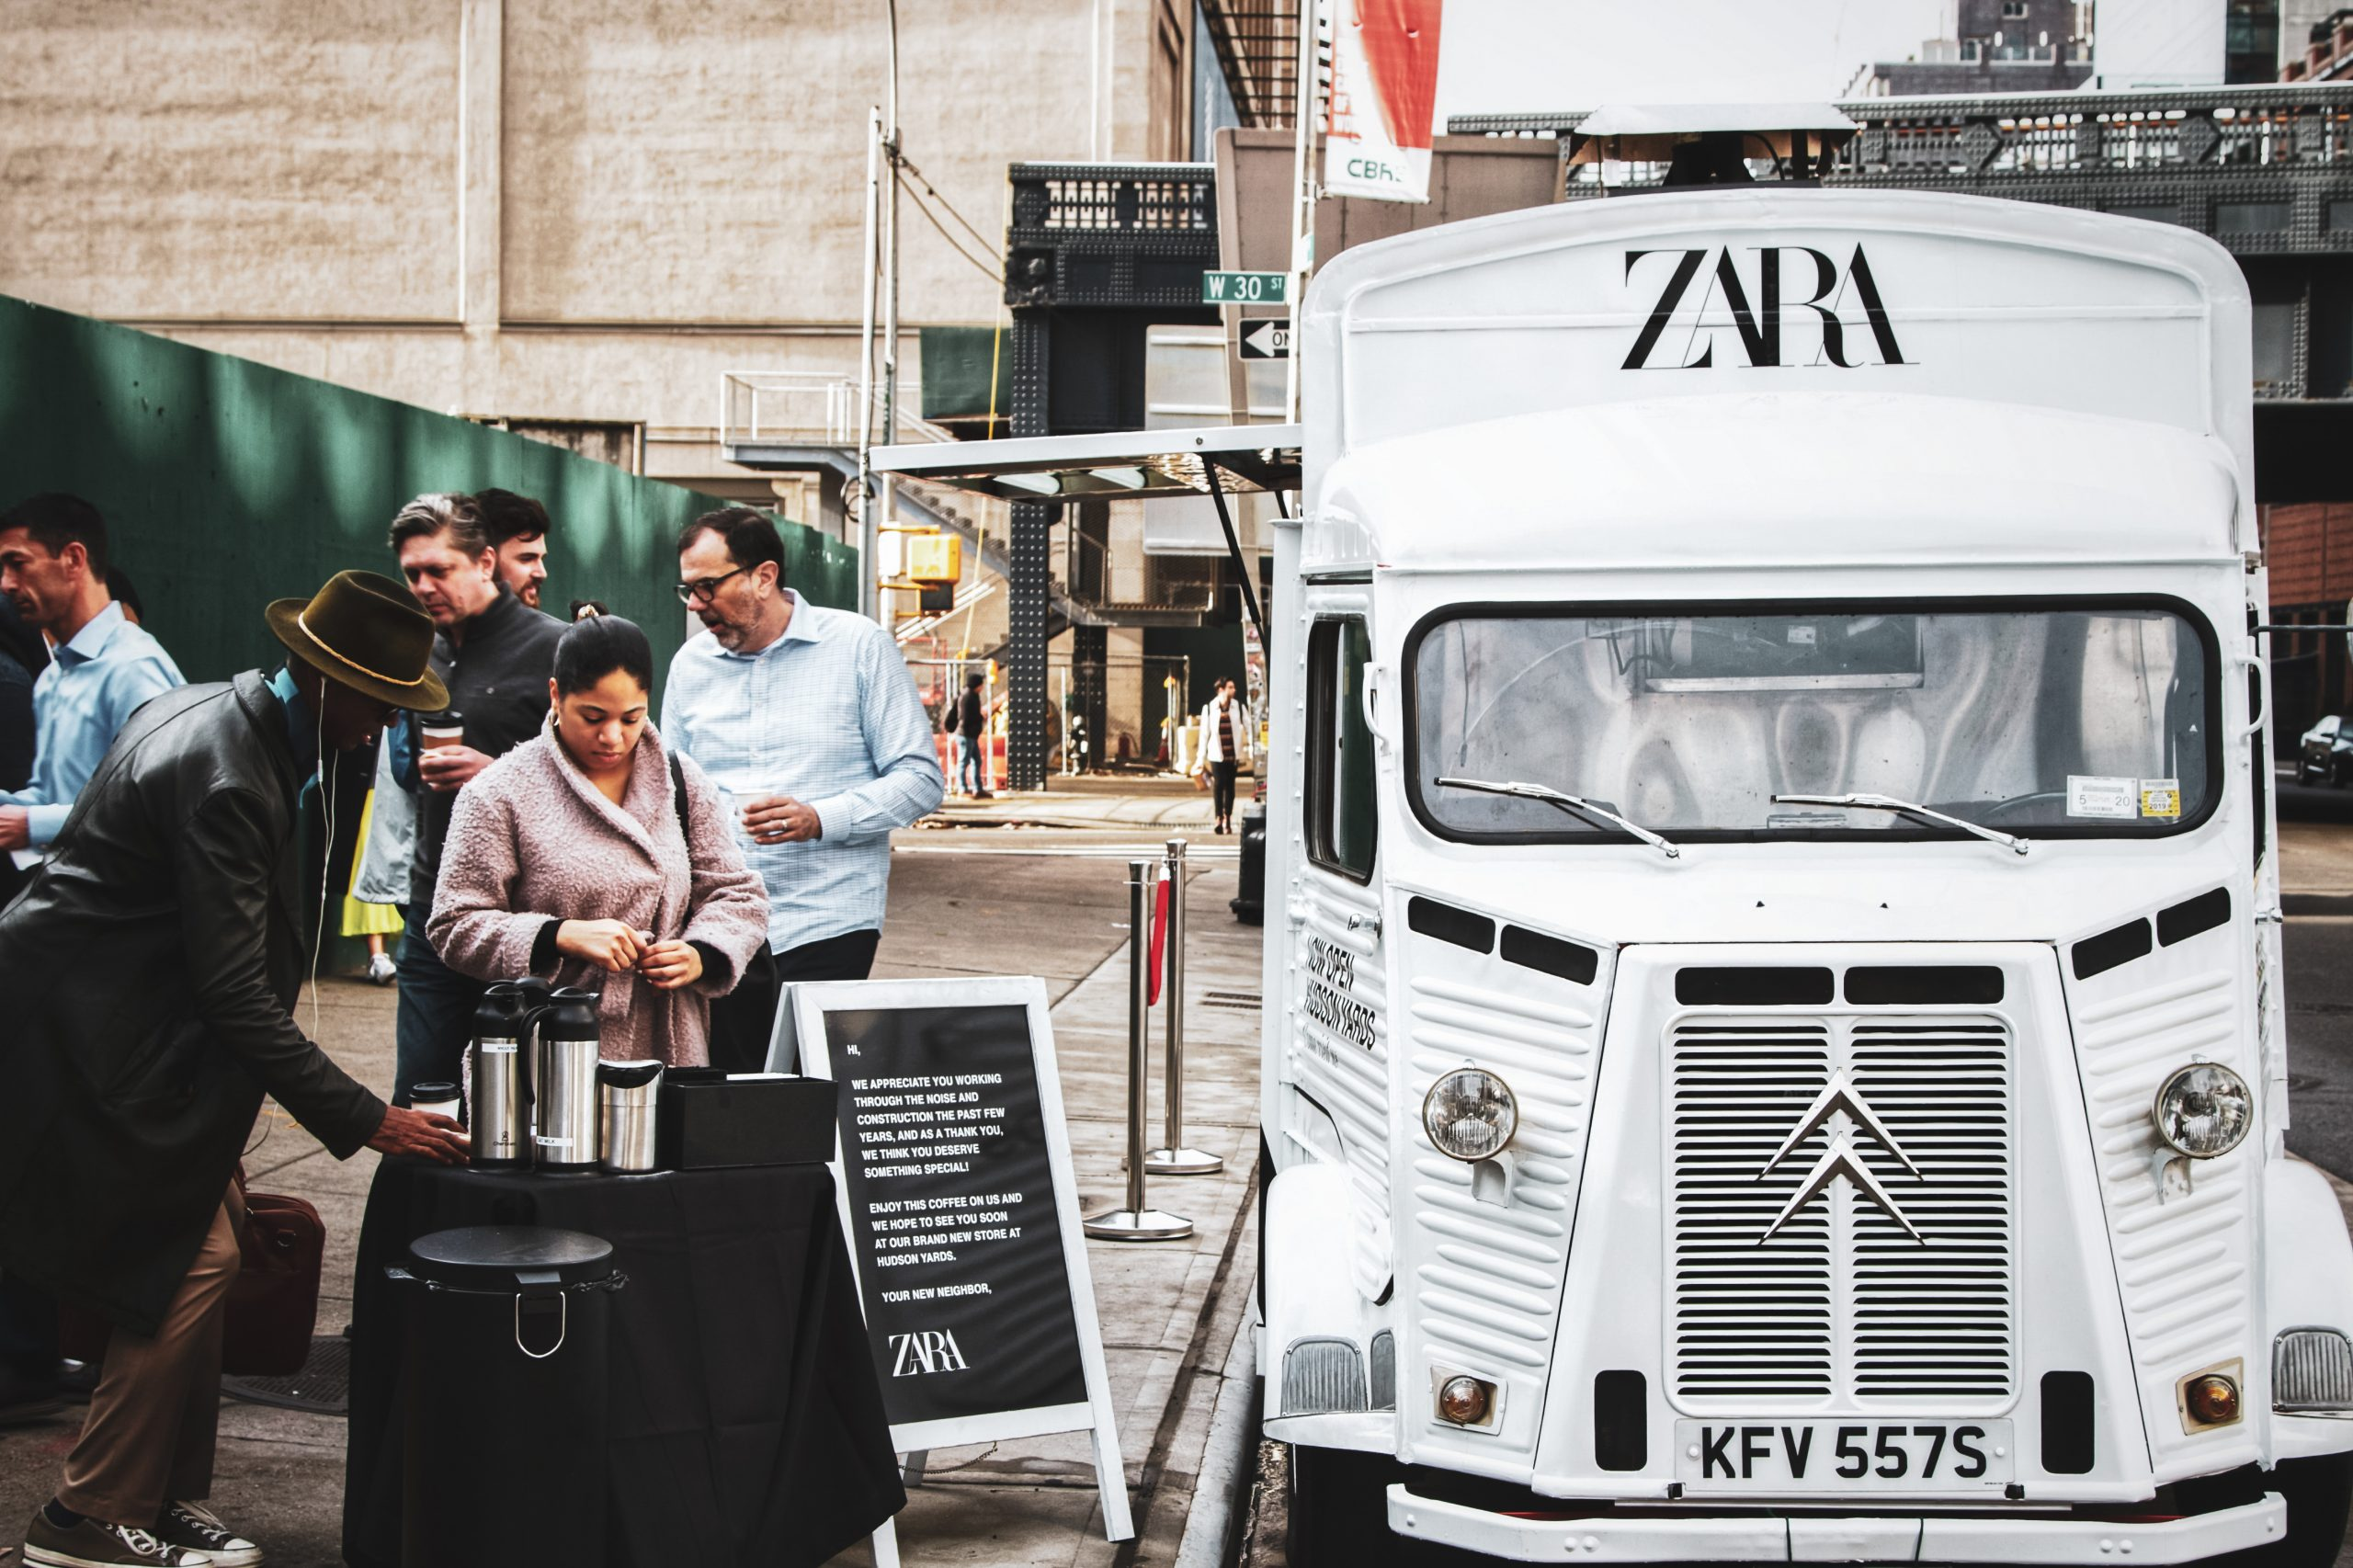 Zara field marketing case study